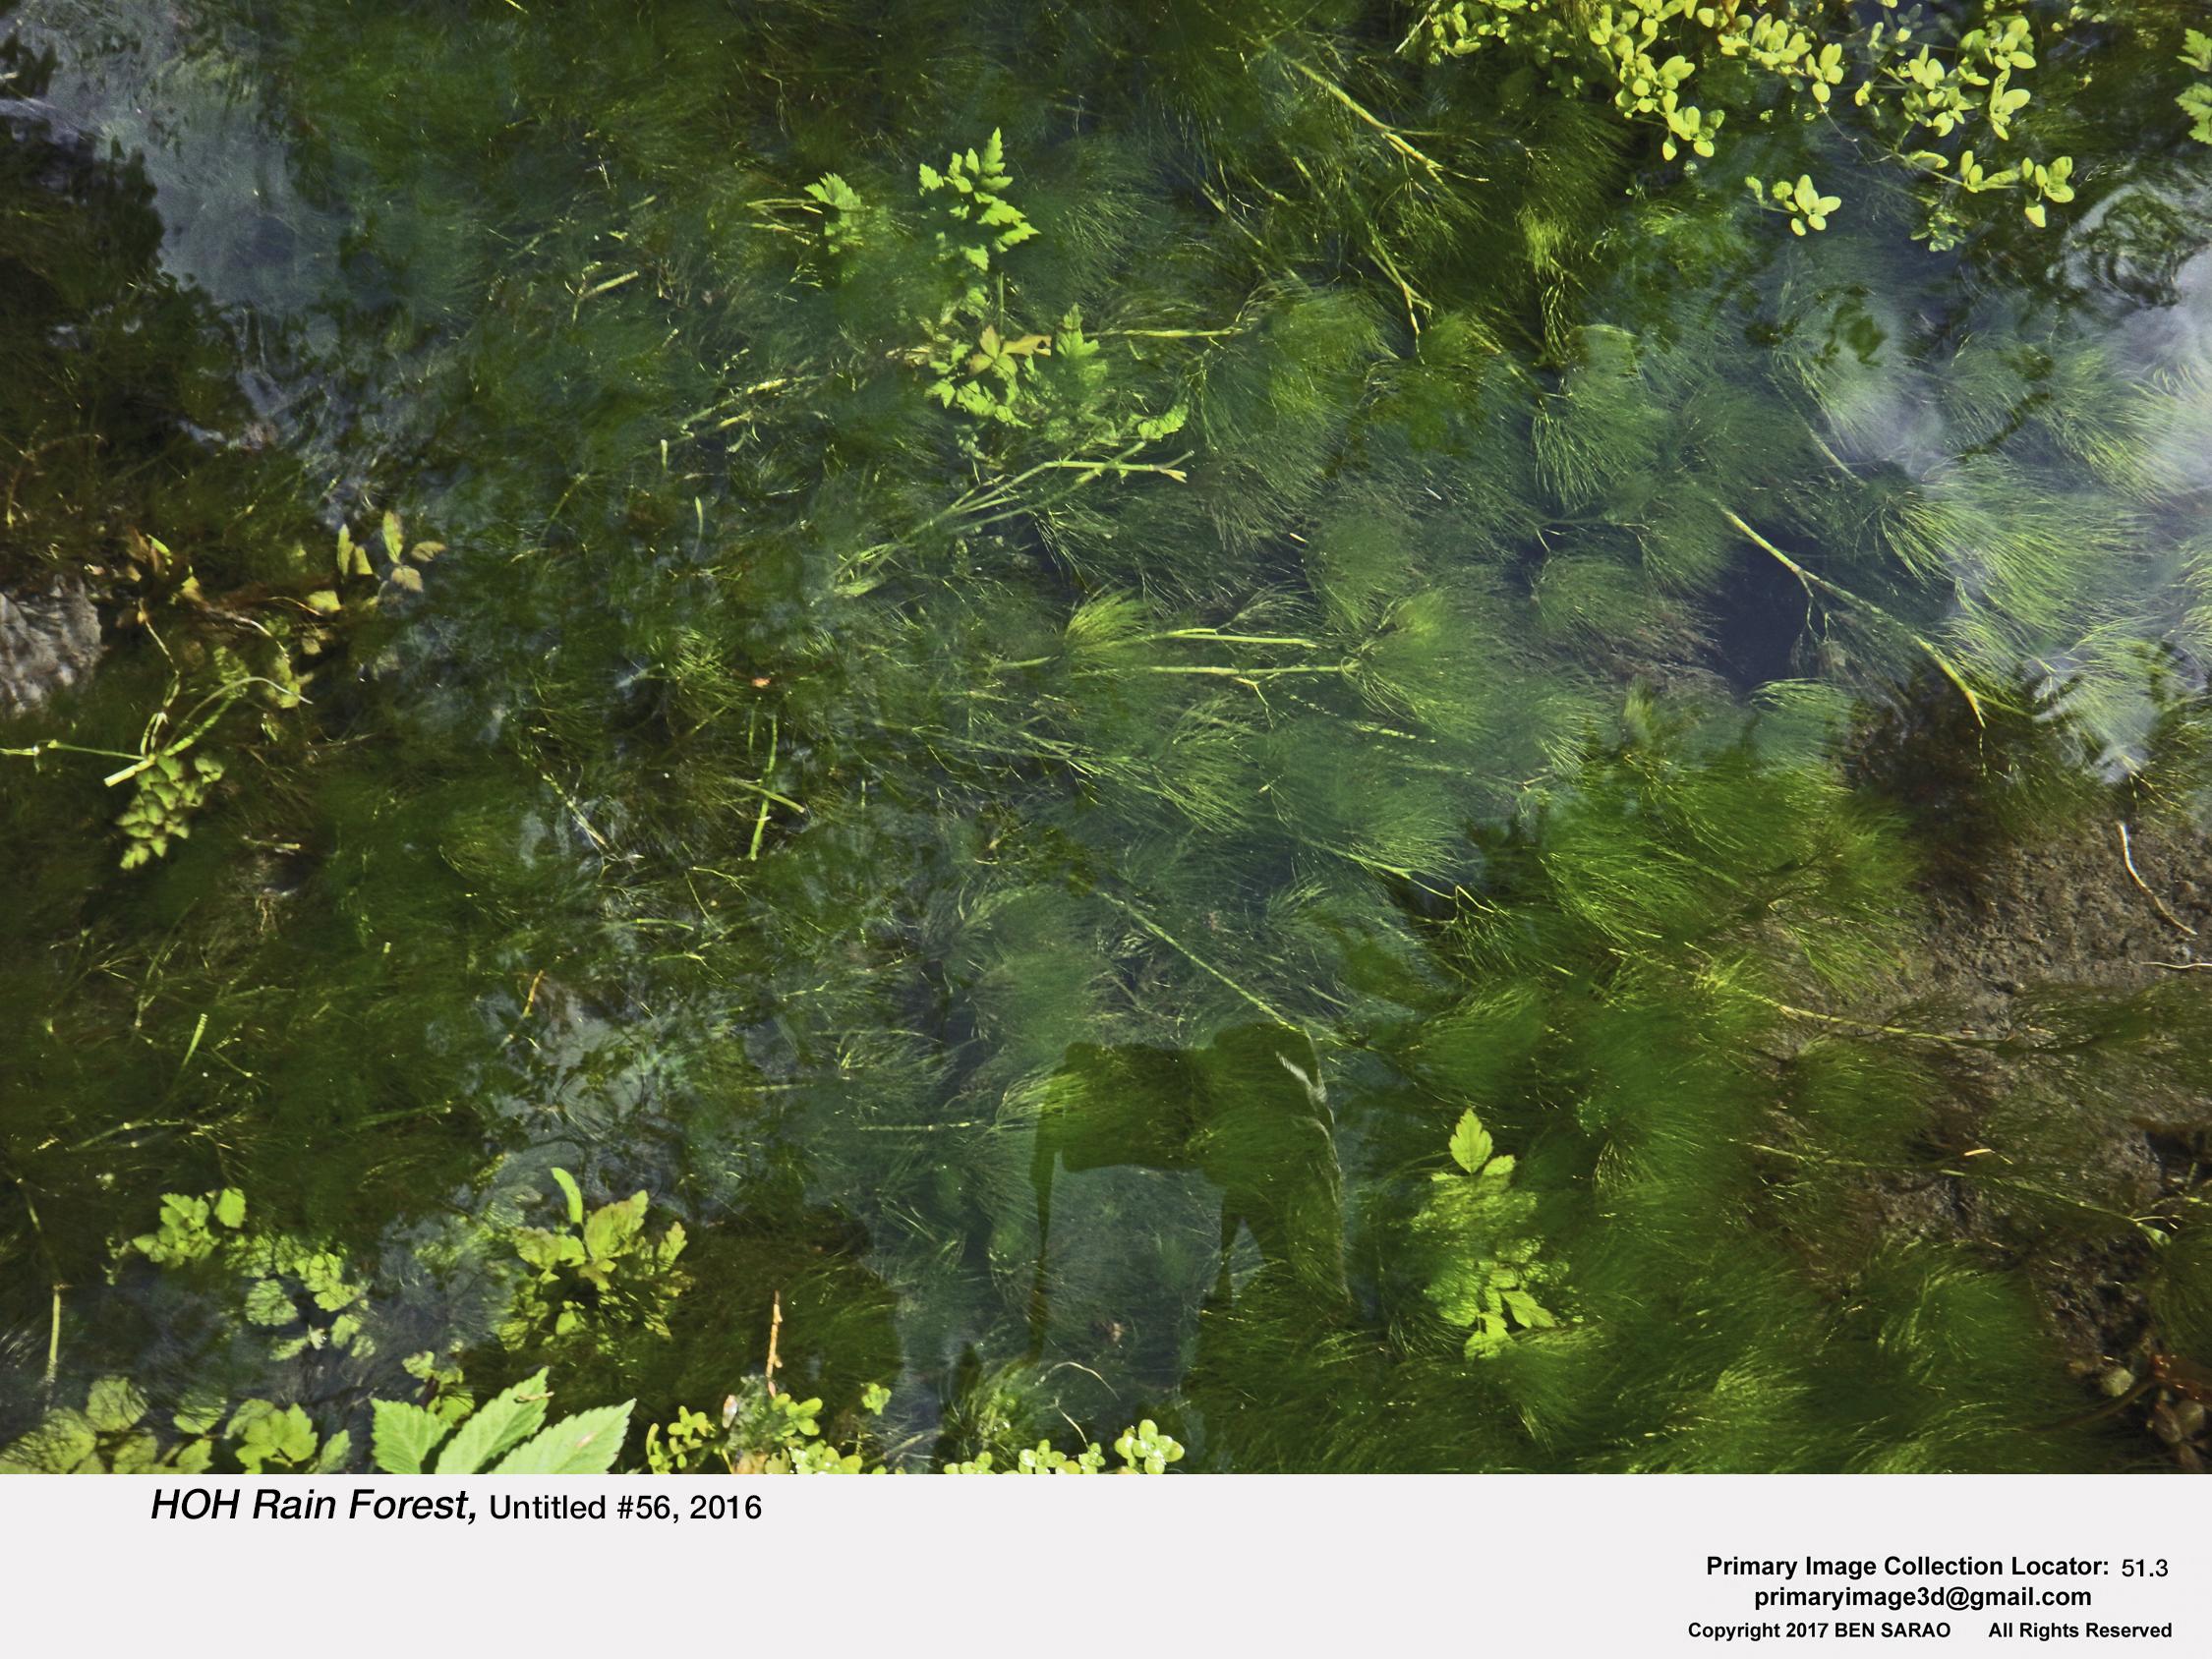 5. HOH Rain Forest 56.jpg